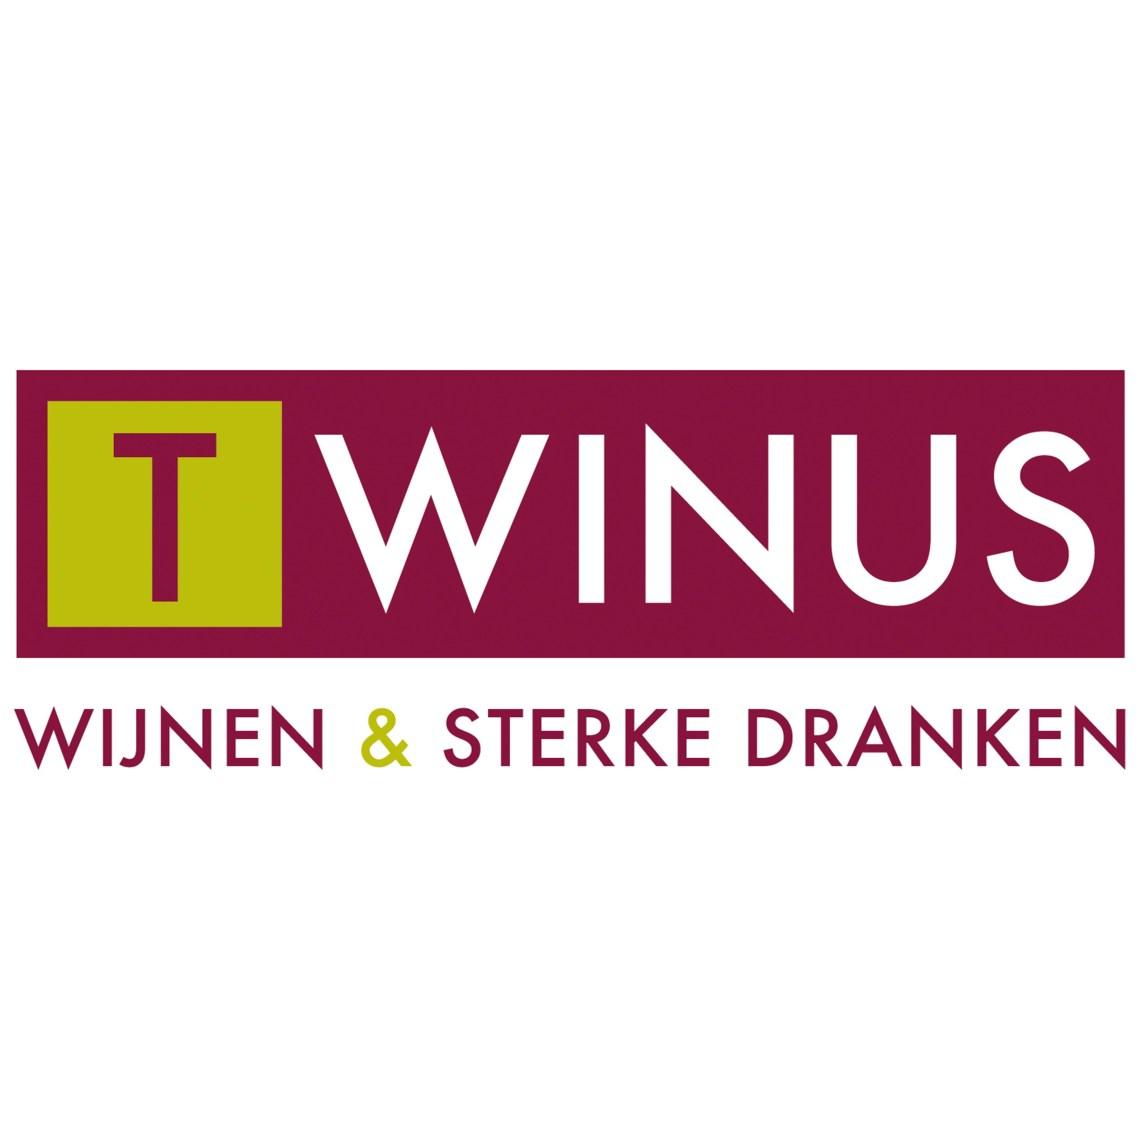 Twinus